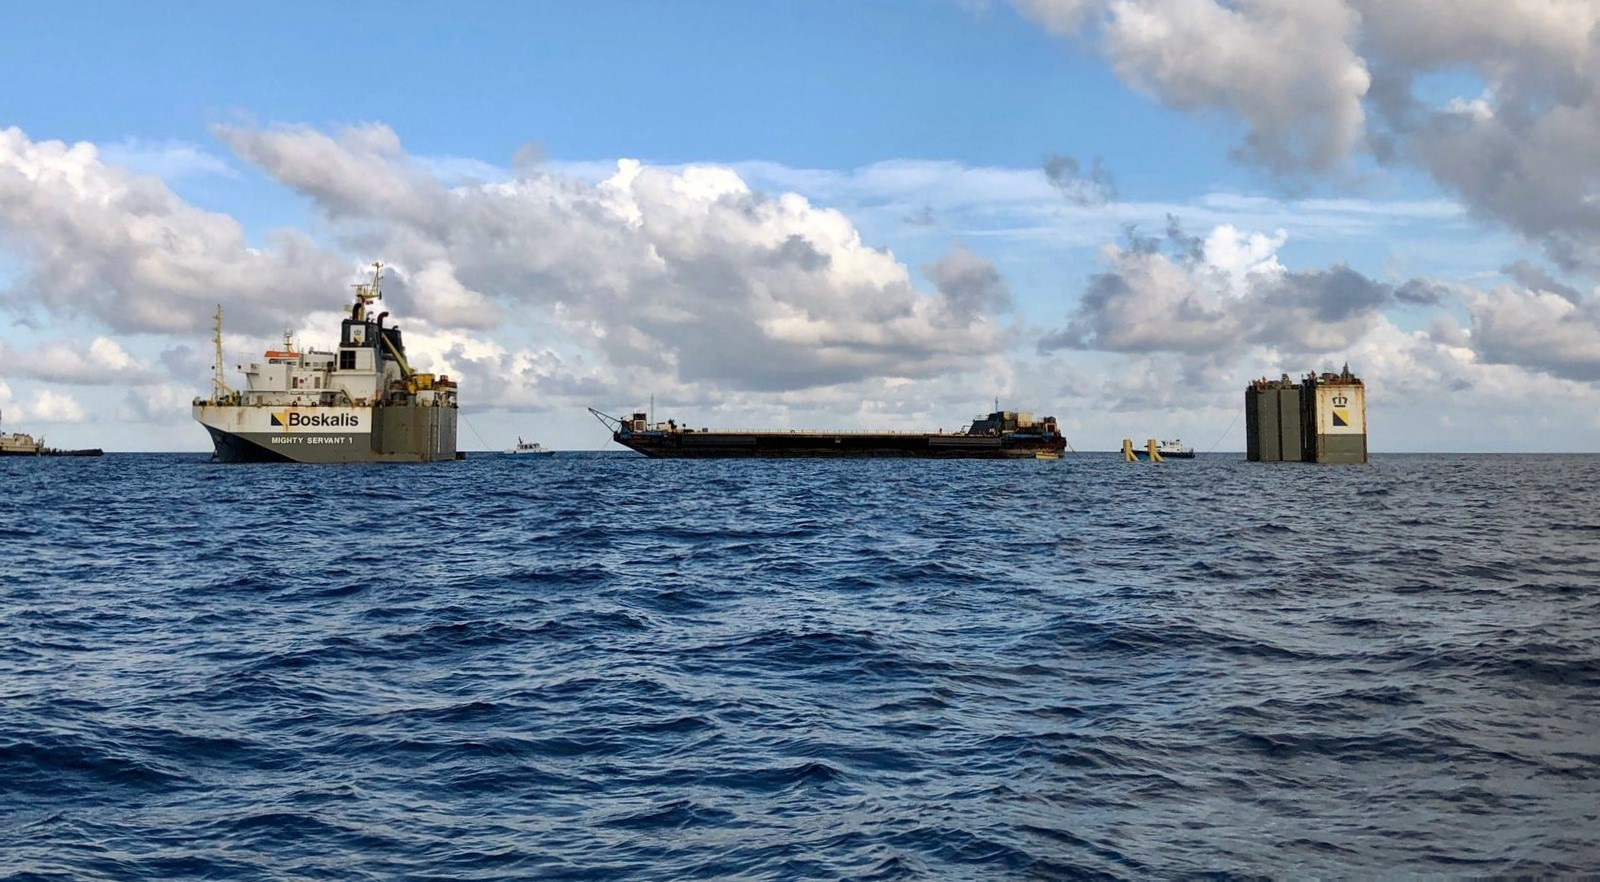 Дрон SpaceX проедет на транспортном судне через Панамский канал